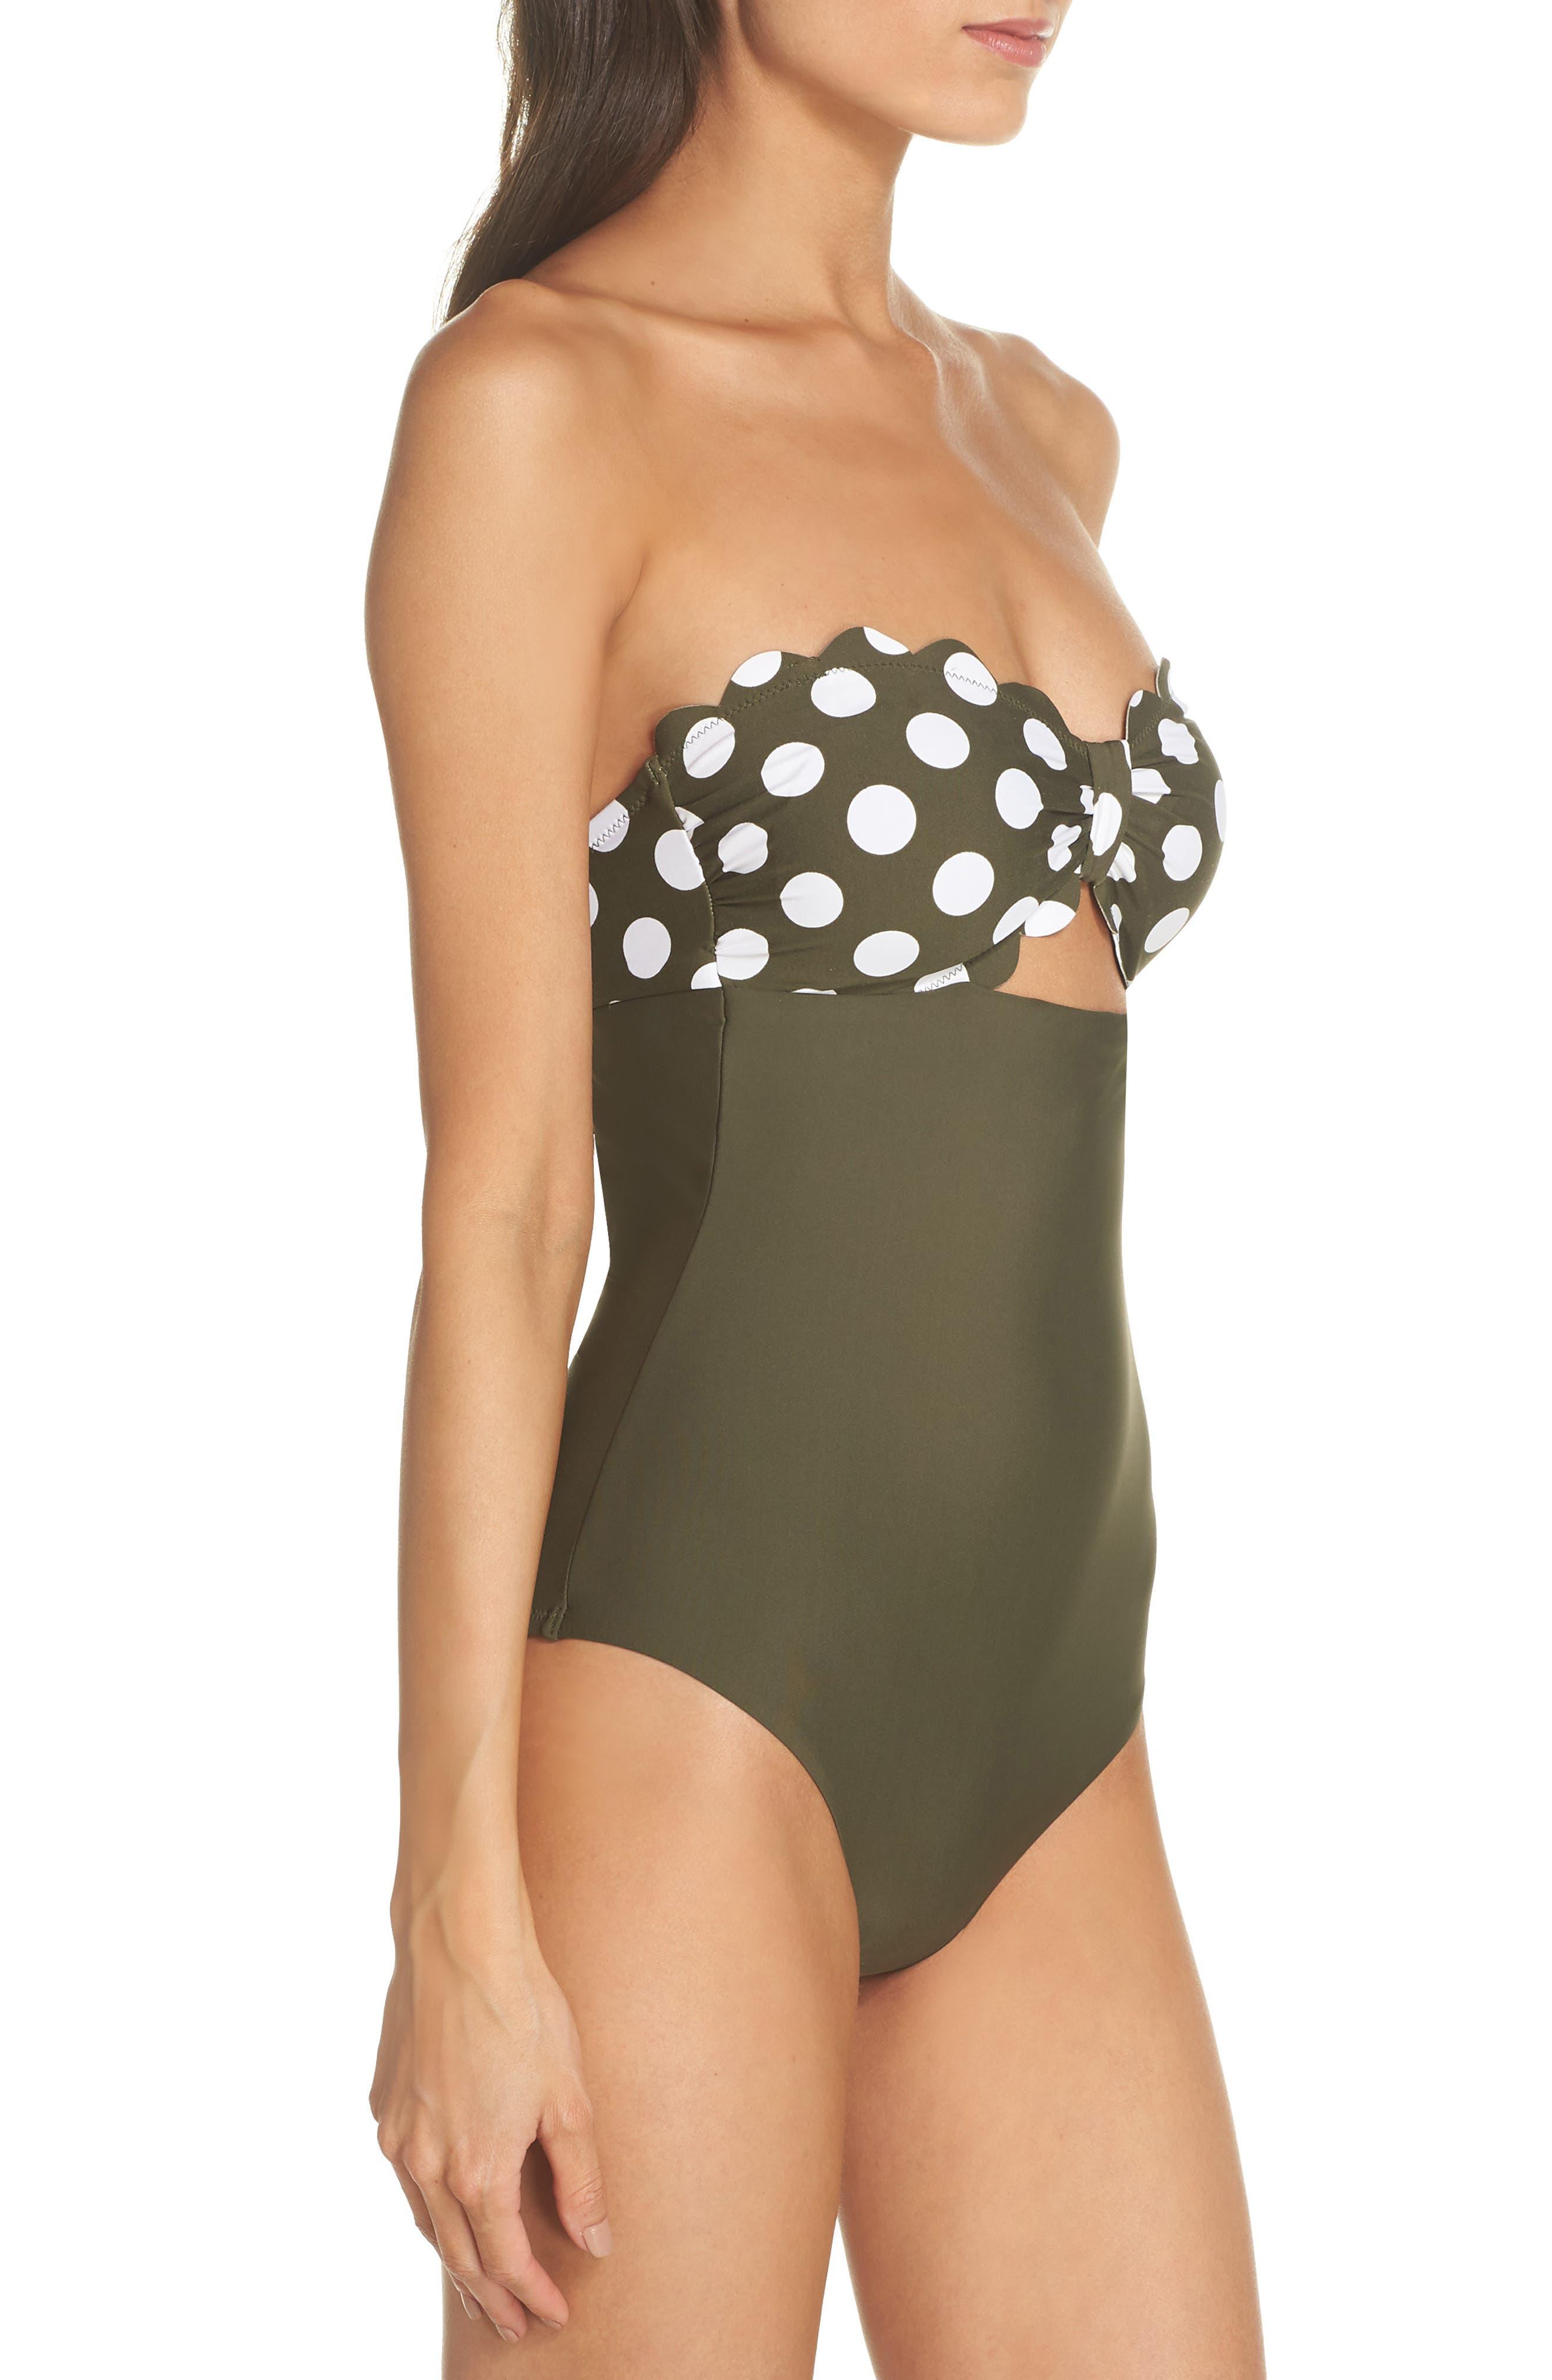 Scallop Bandeau One-Piece Swimsuit,                             Alternate thumbnail 4, color,                             OLIVE SARMA/ IVORY EGRET DOT